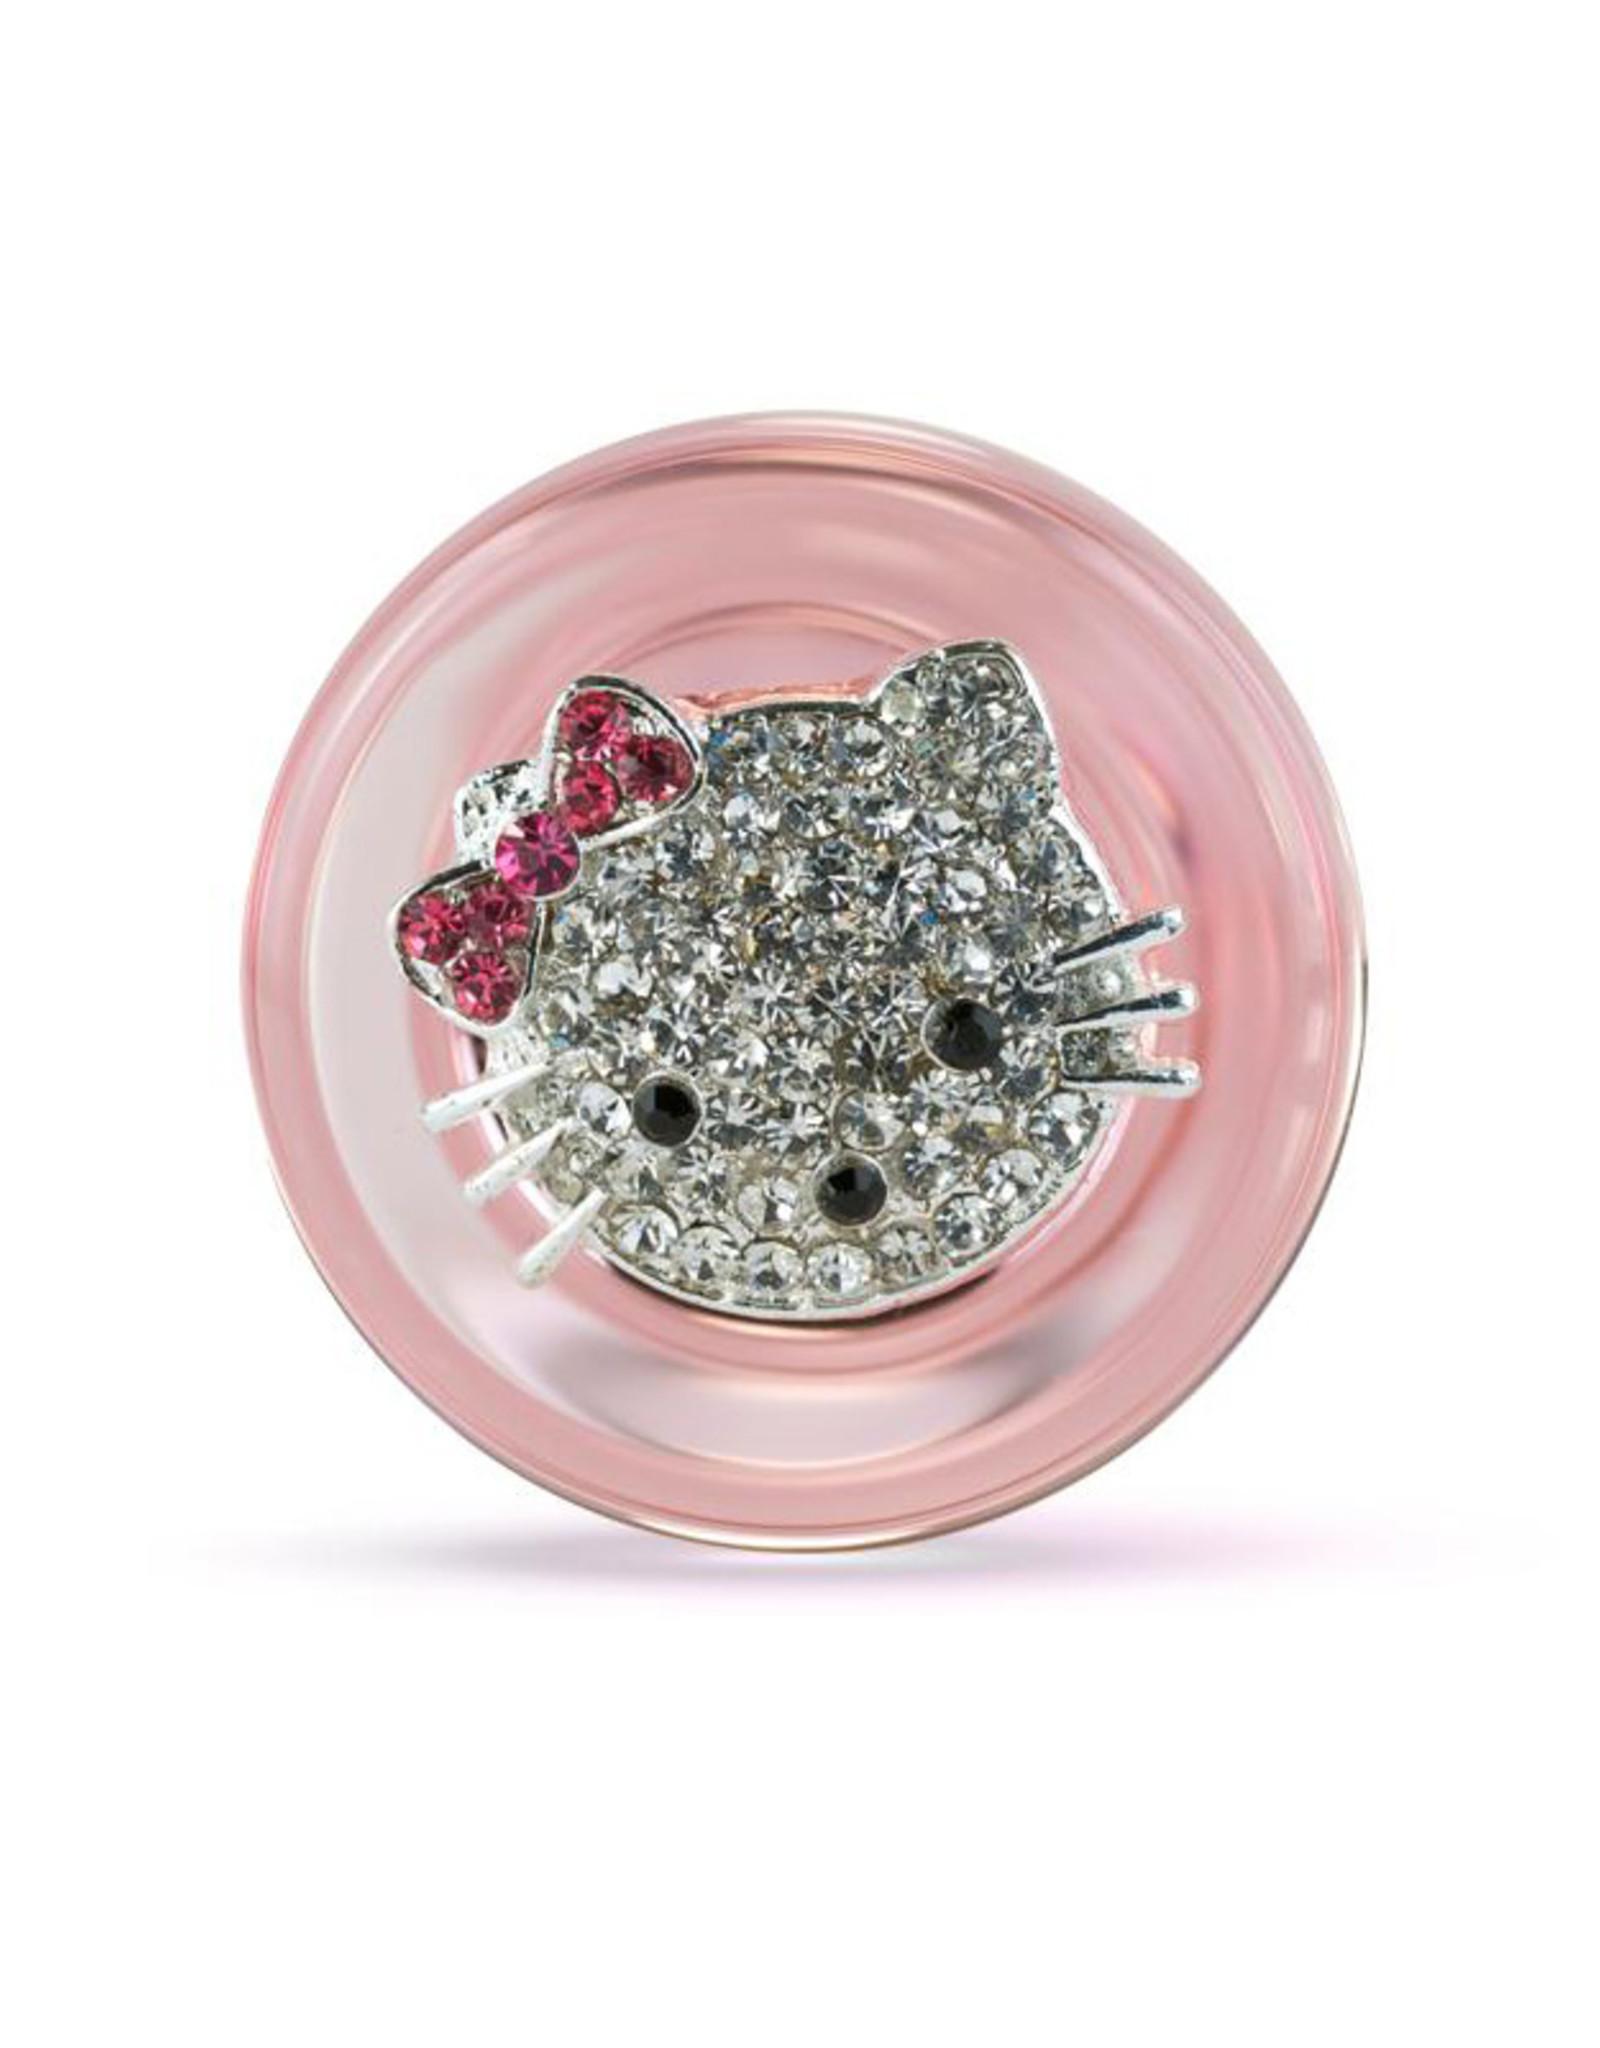 Crystal Delights Sm Plug w/ Kitty Pink